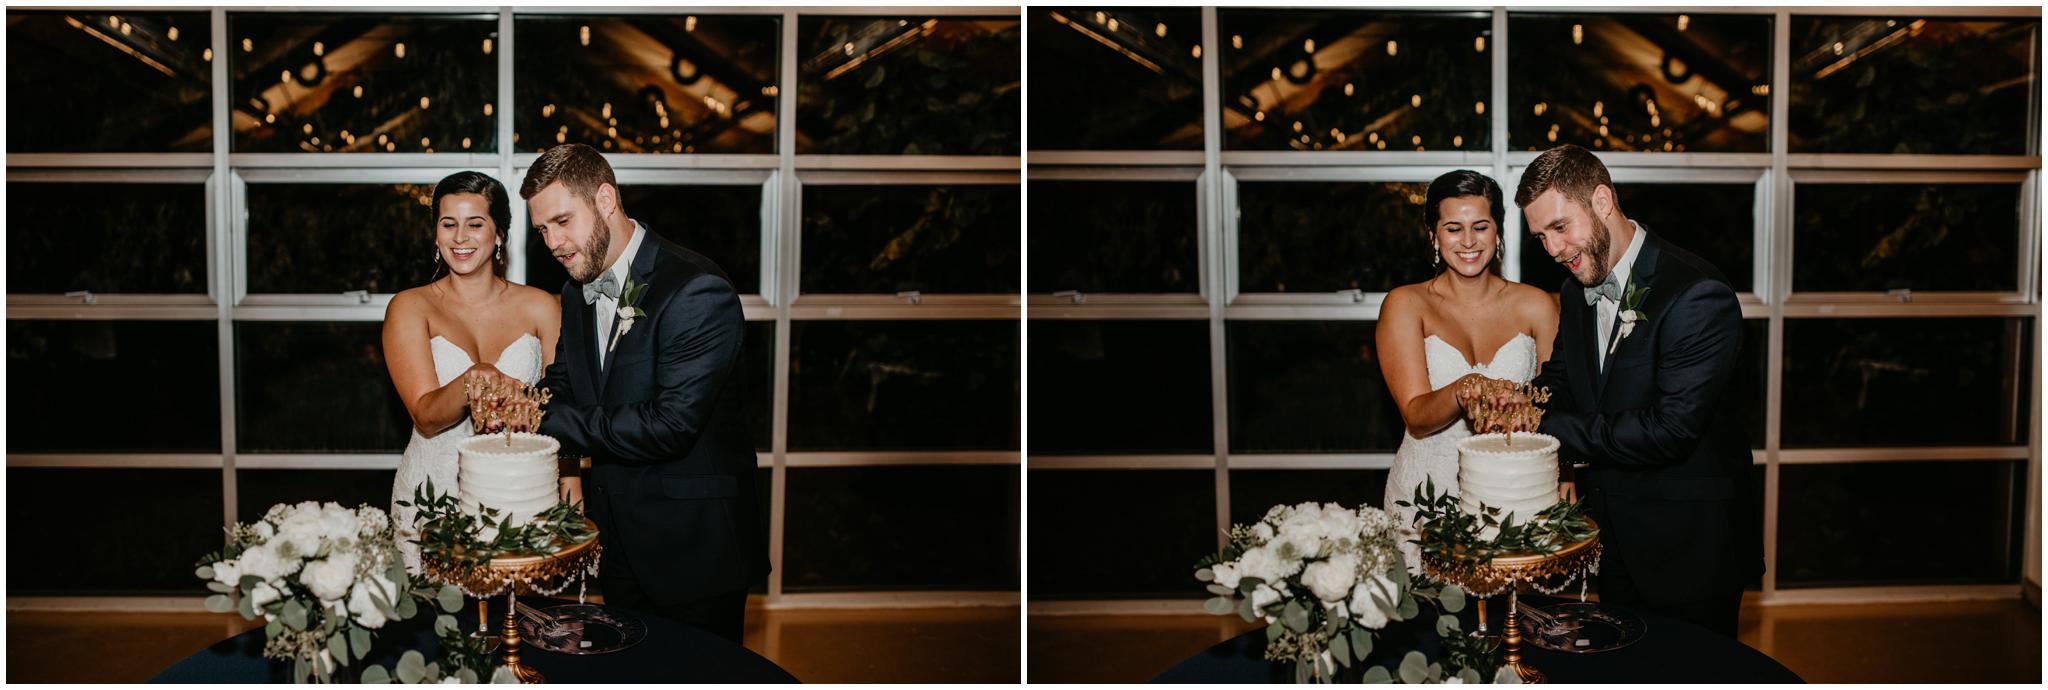 ashley-tj-the-pickering-barn-winter-wedding-seattle-photographer-079.jpg